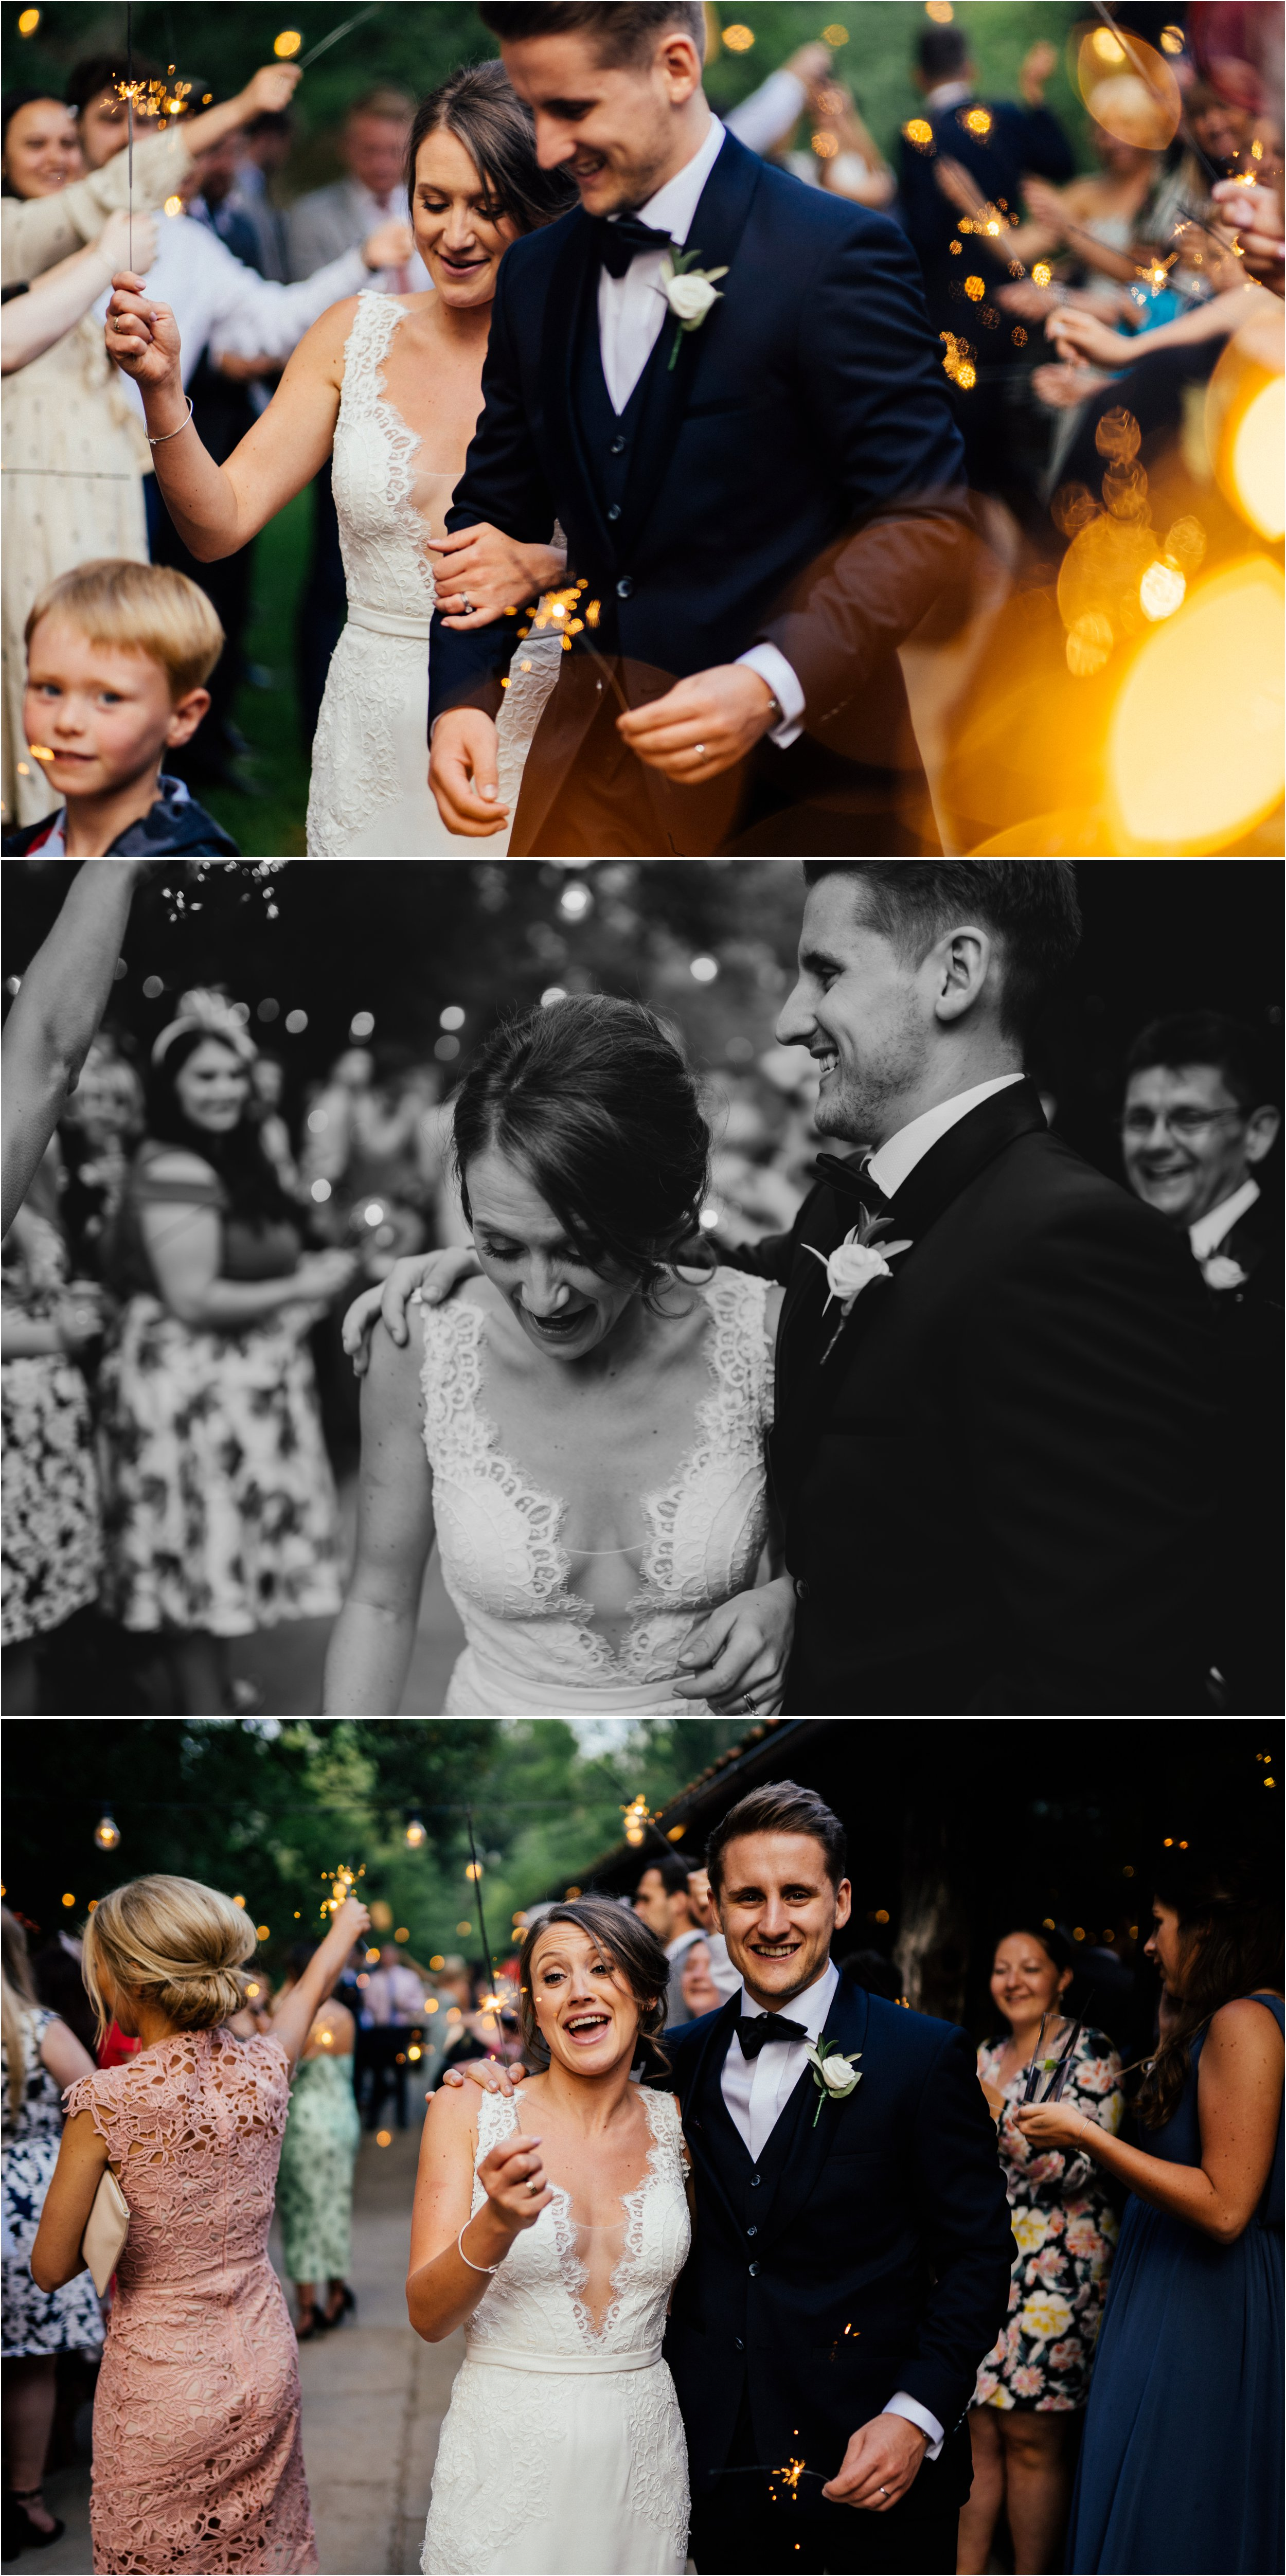 Dewsall Court Herefordshire wedding photographer_0114.jpg